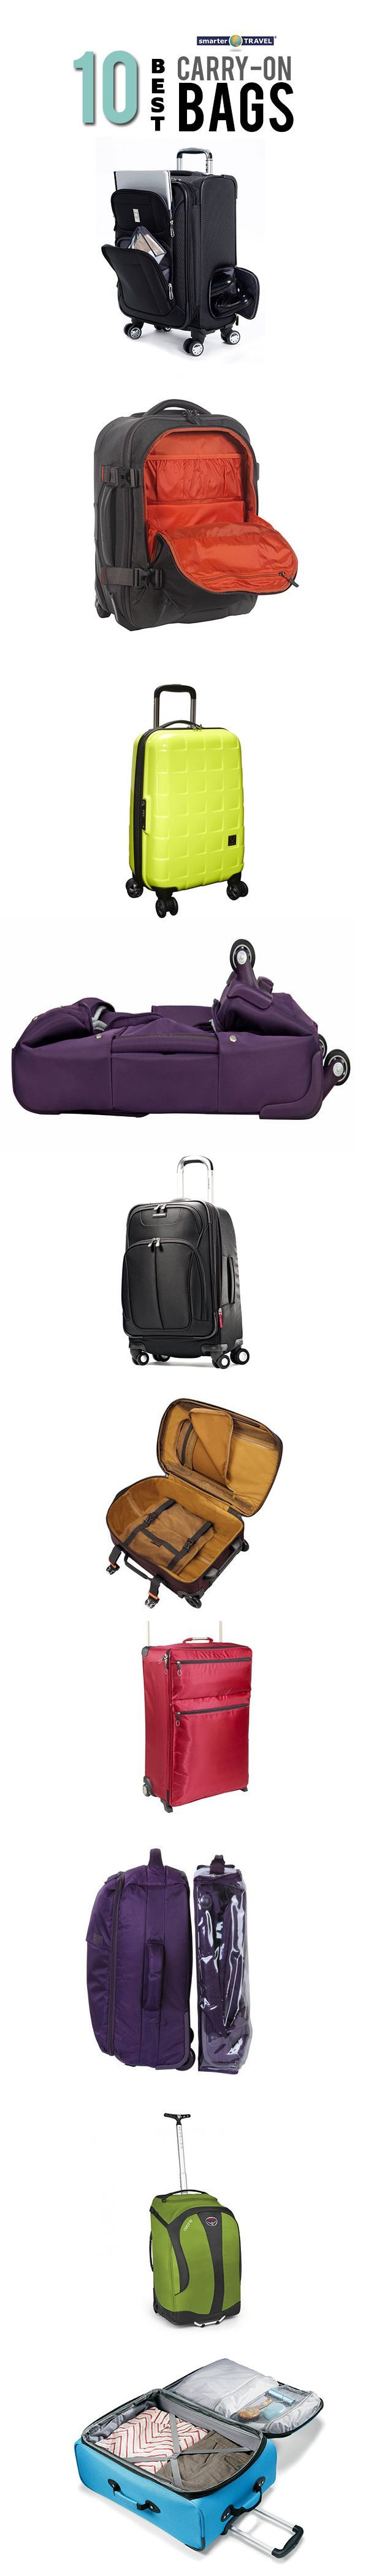 Free-2 Thin Bl-ue Line Fl-ag Luggage Tag 3D Print Leather Travel Bag ID Card